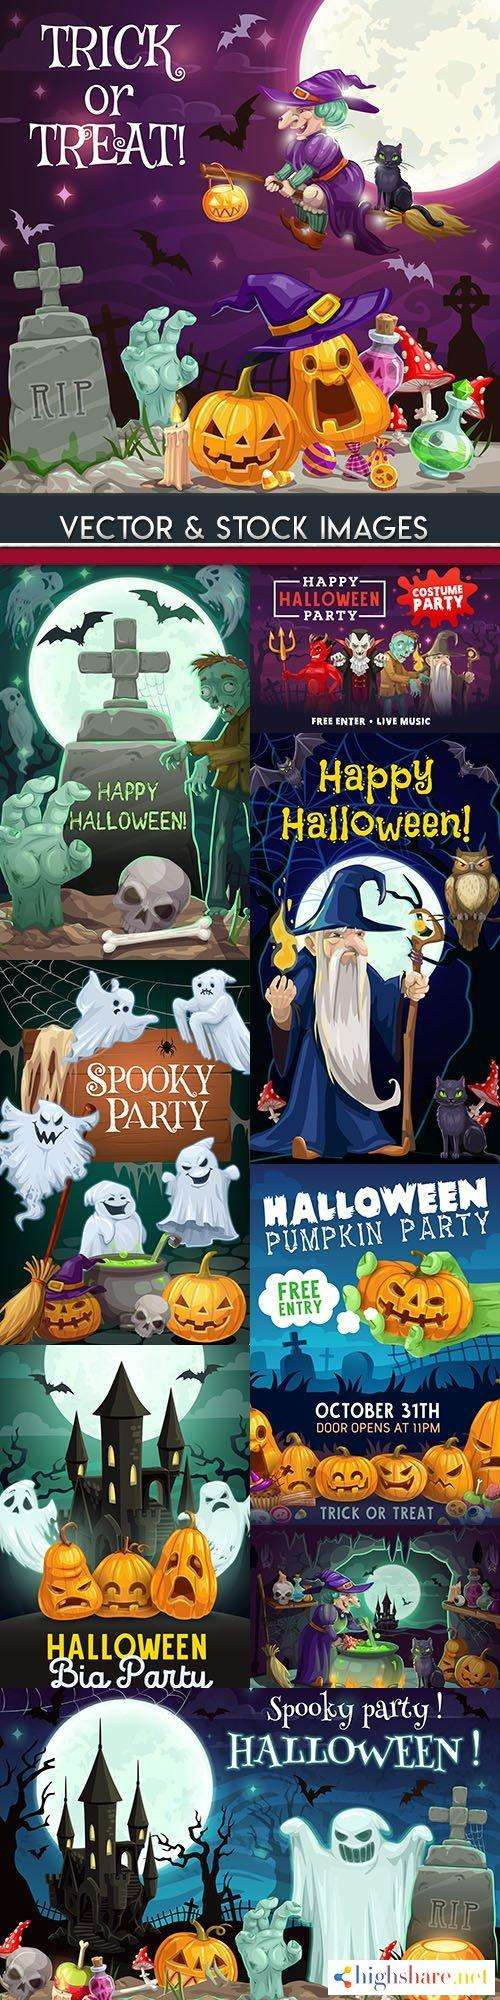 happy halloween holiday cartoon illustration collection 22 5f4d01c8168c6 - Happy Halloween holiday cartoon illustration collection 22